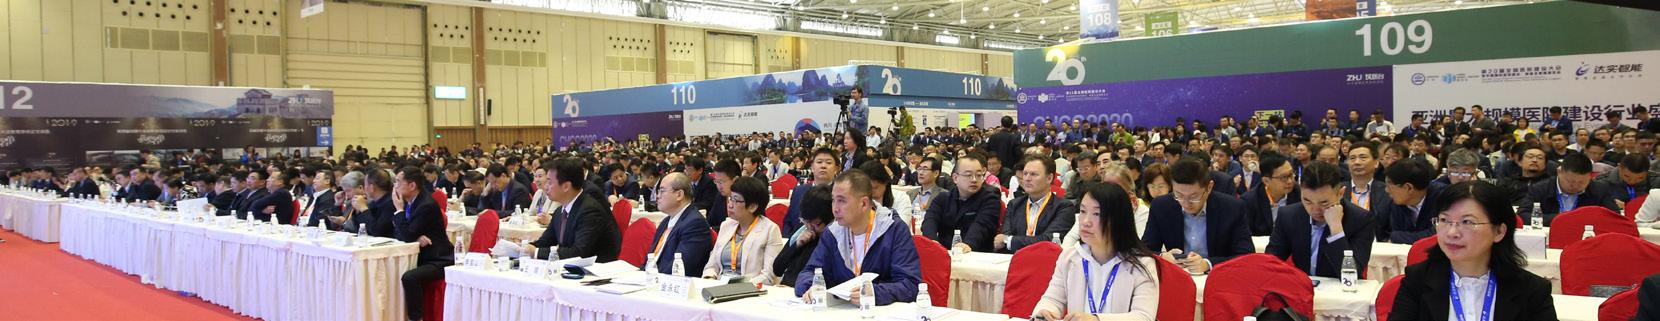 CHCC2021第二十二届全国医院建设大会暨中国国际医院建设、装备及管理展览会(CHCC2021)  The 22st China Hospital Construction ConferenceHo